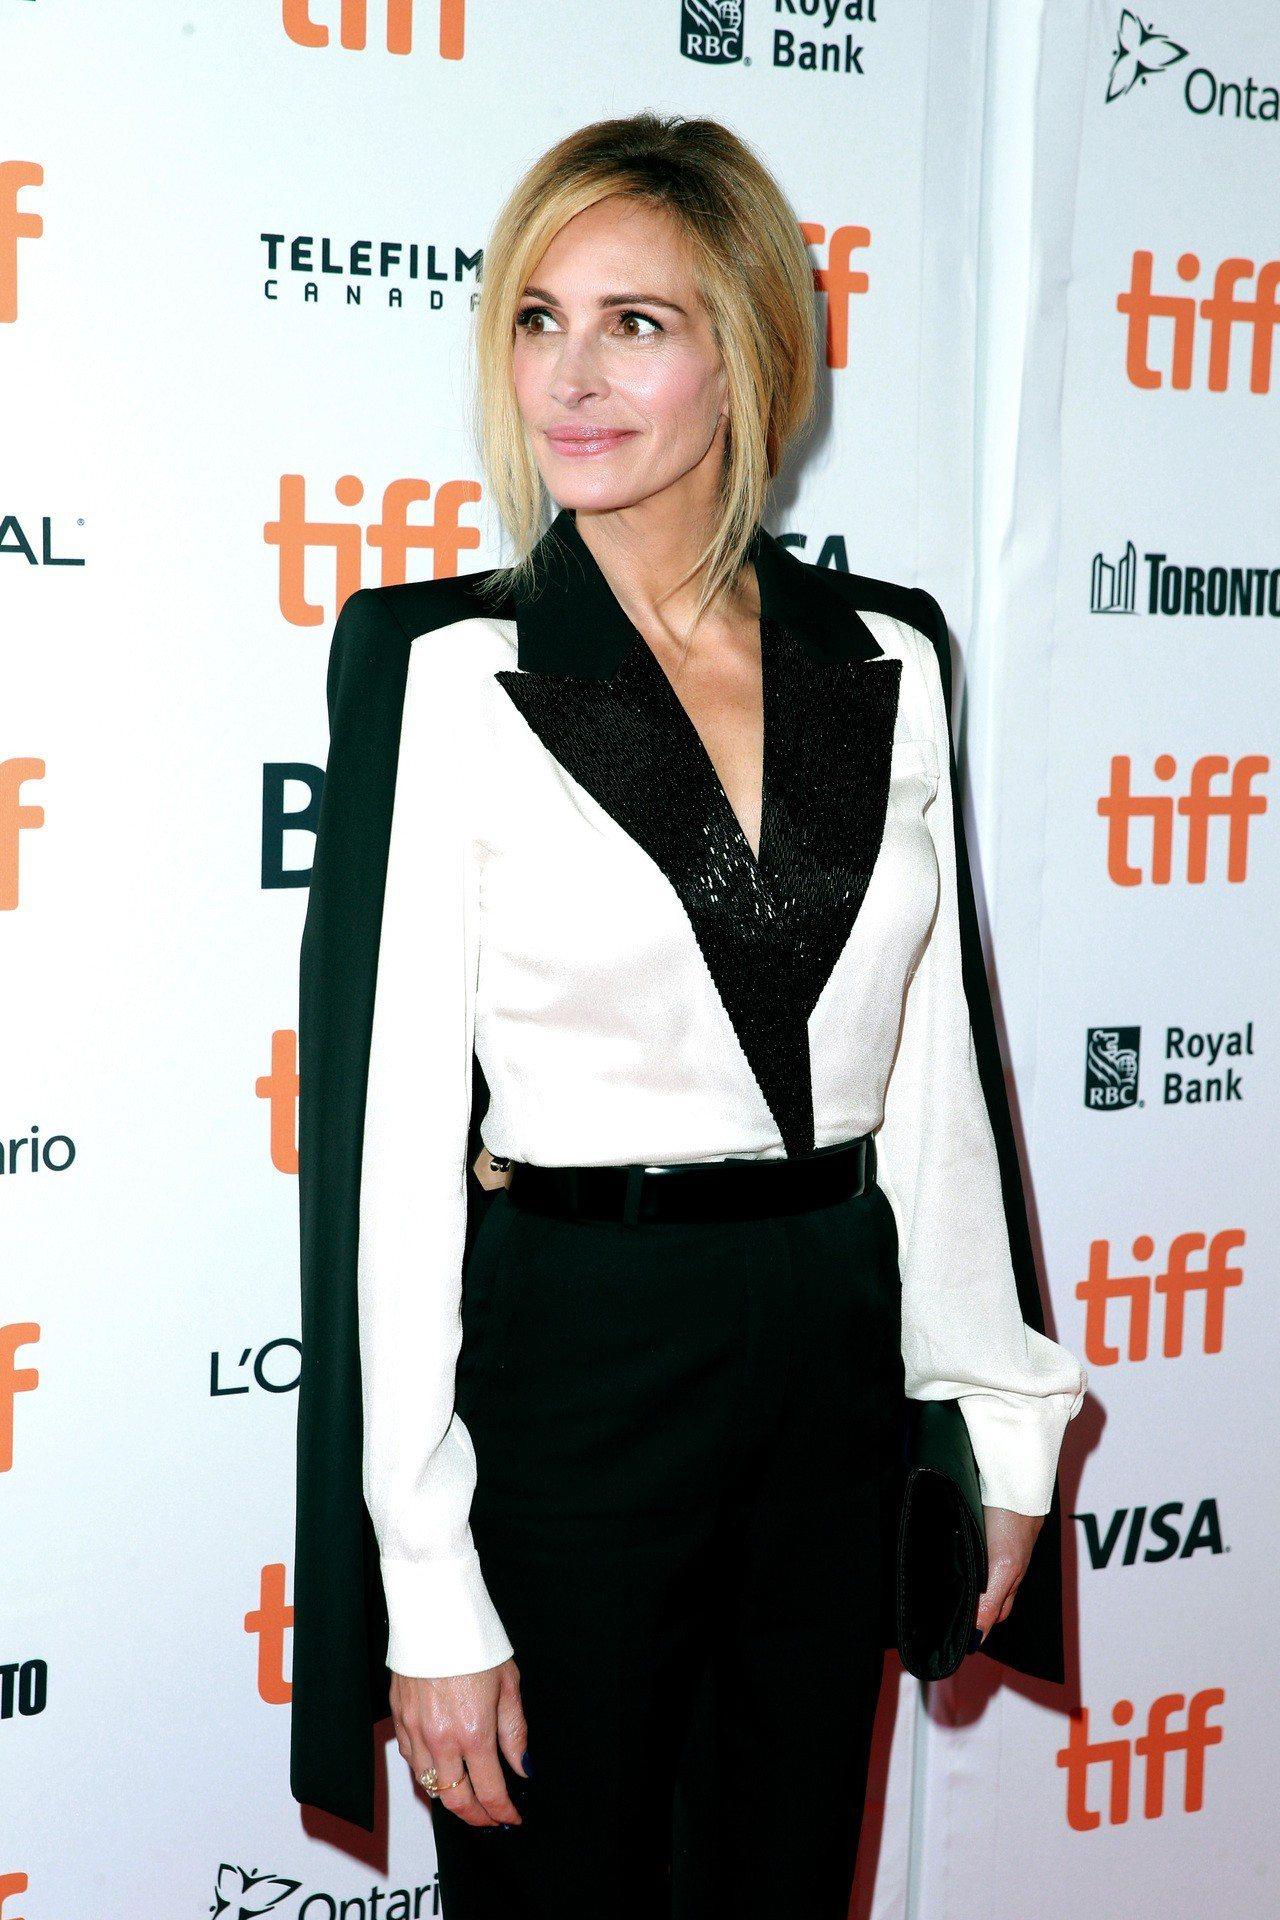 茱莉亞羅勃茲這套GIVENCHY的黑白褲裝相當出色。圖/GIVENCHY提供